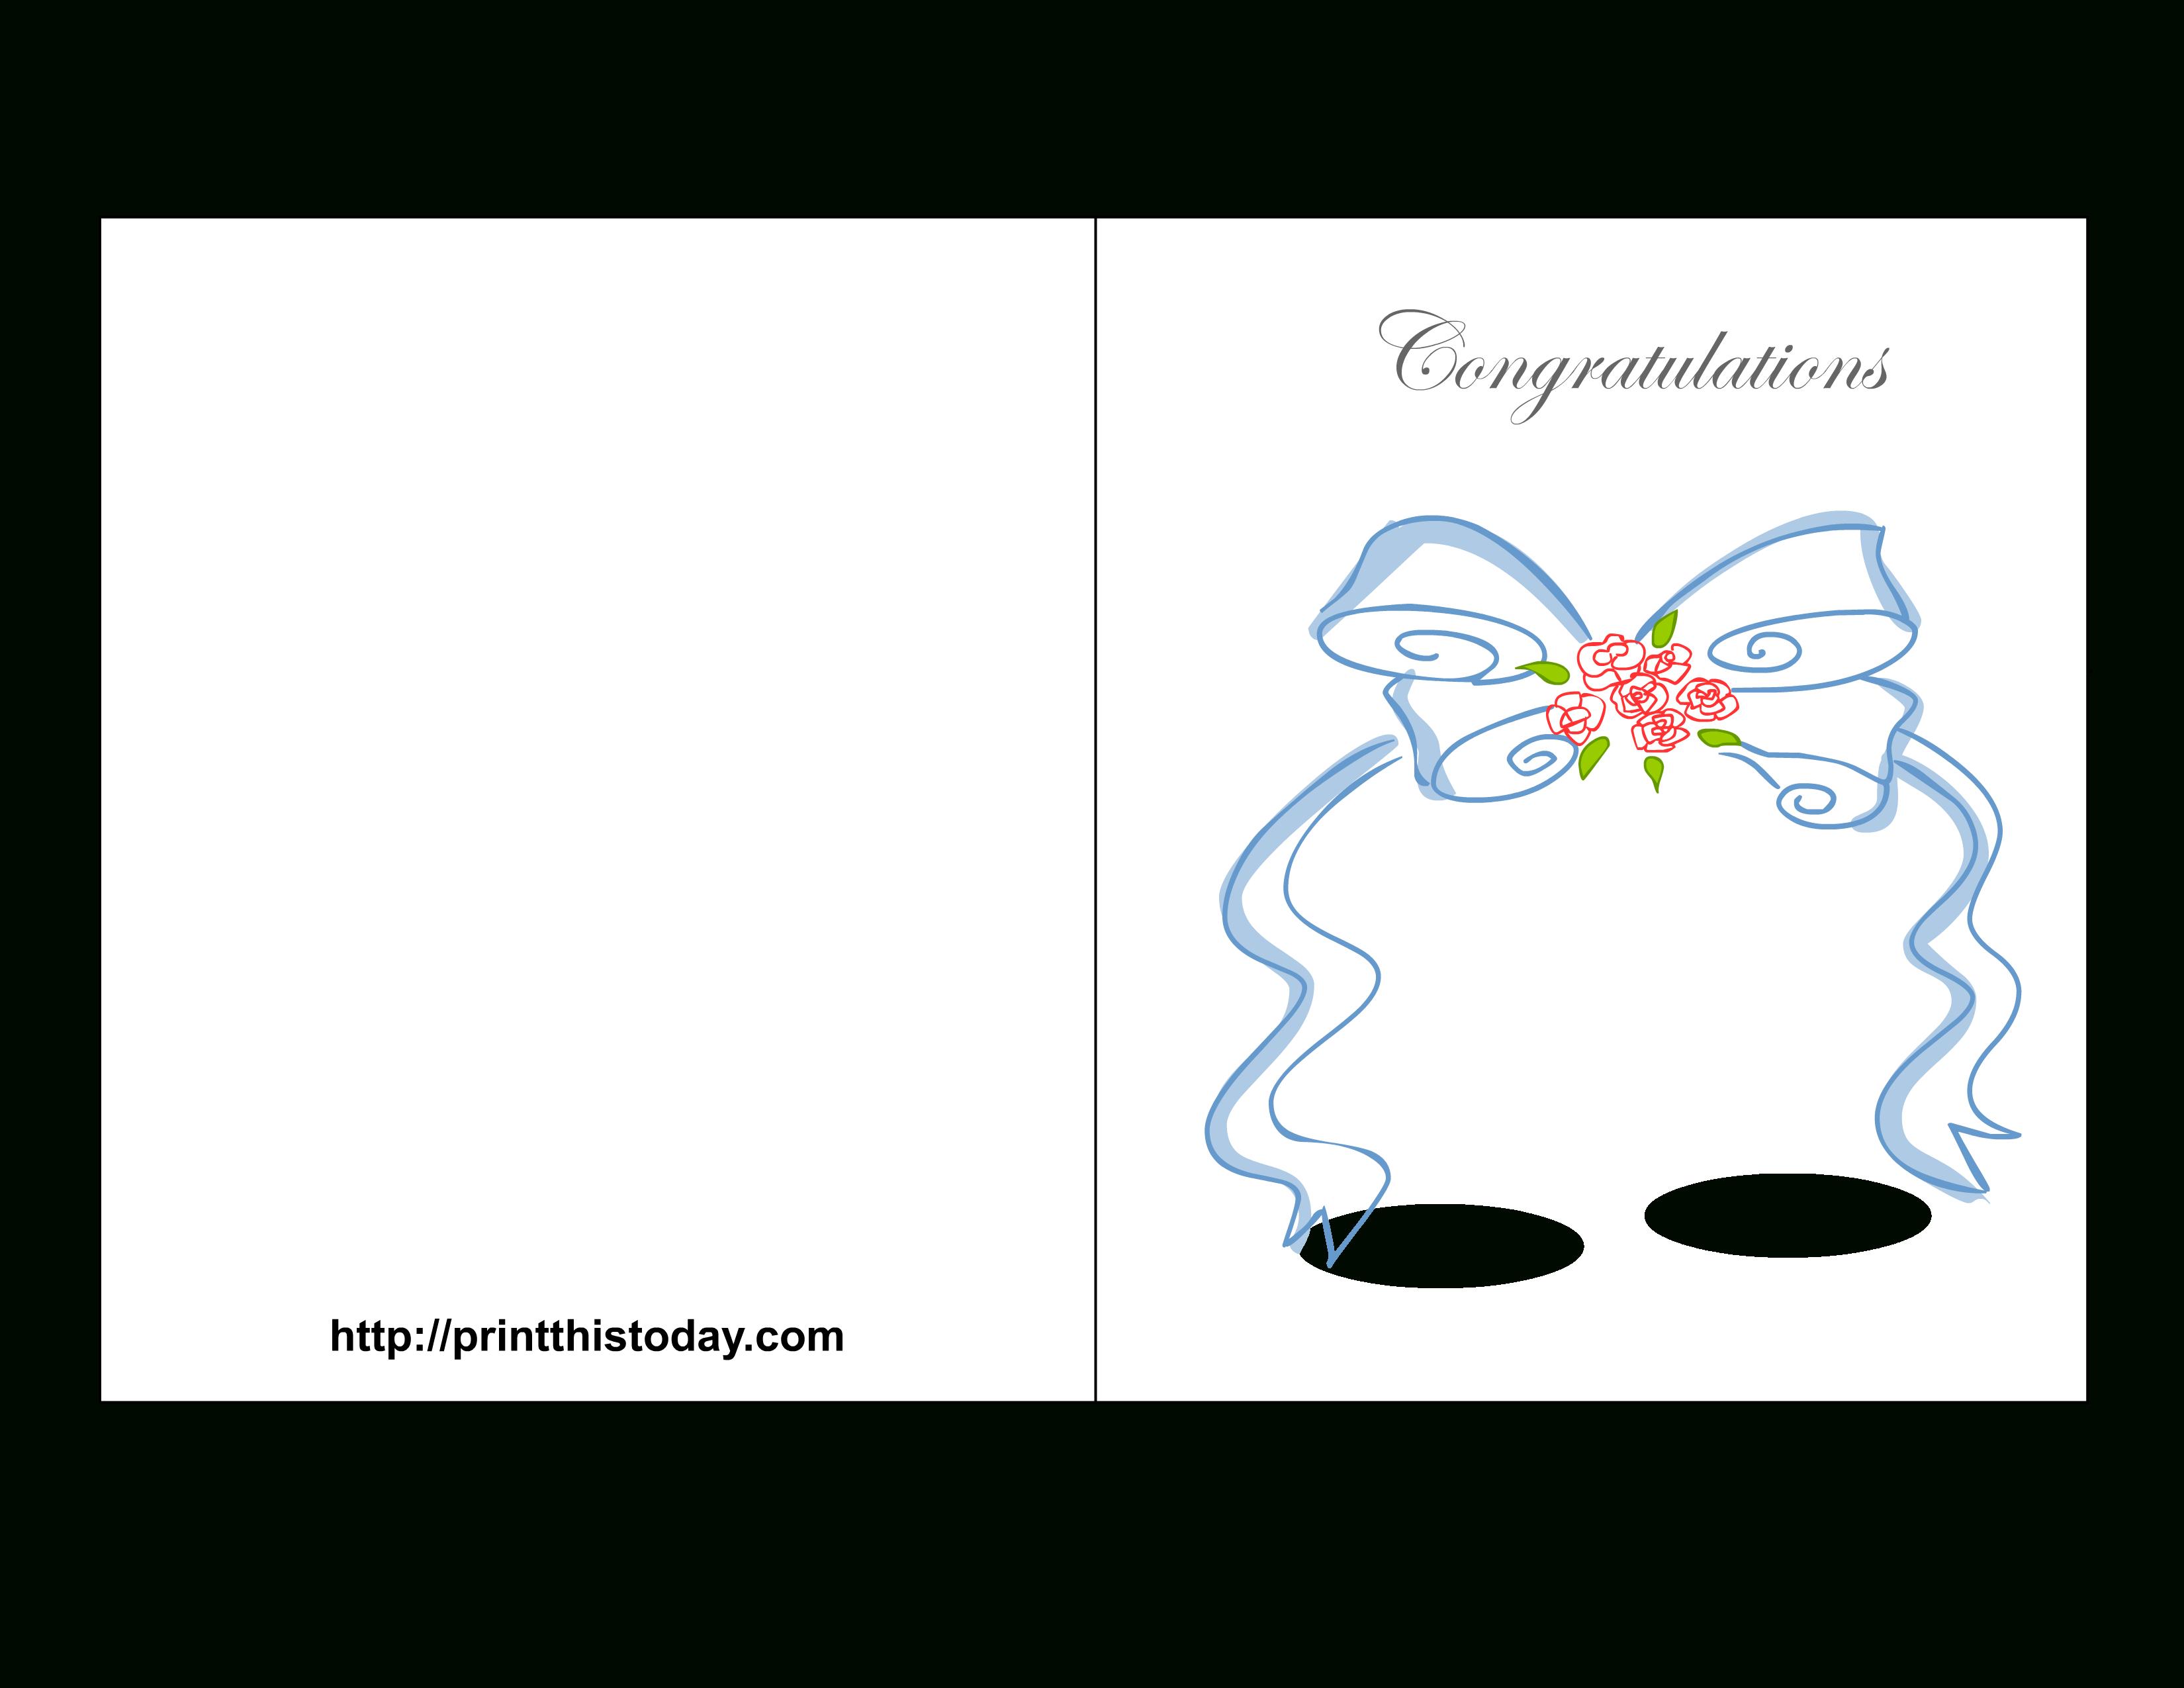 Free Printable Wedding Congratulations Cards - Free Printable Congratulations Baby Cards